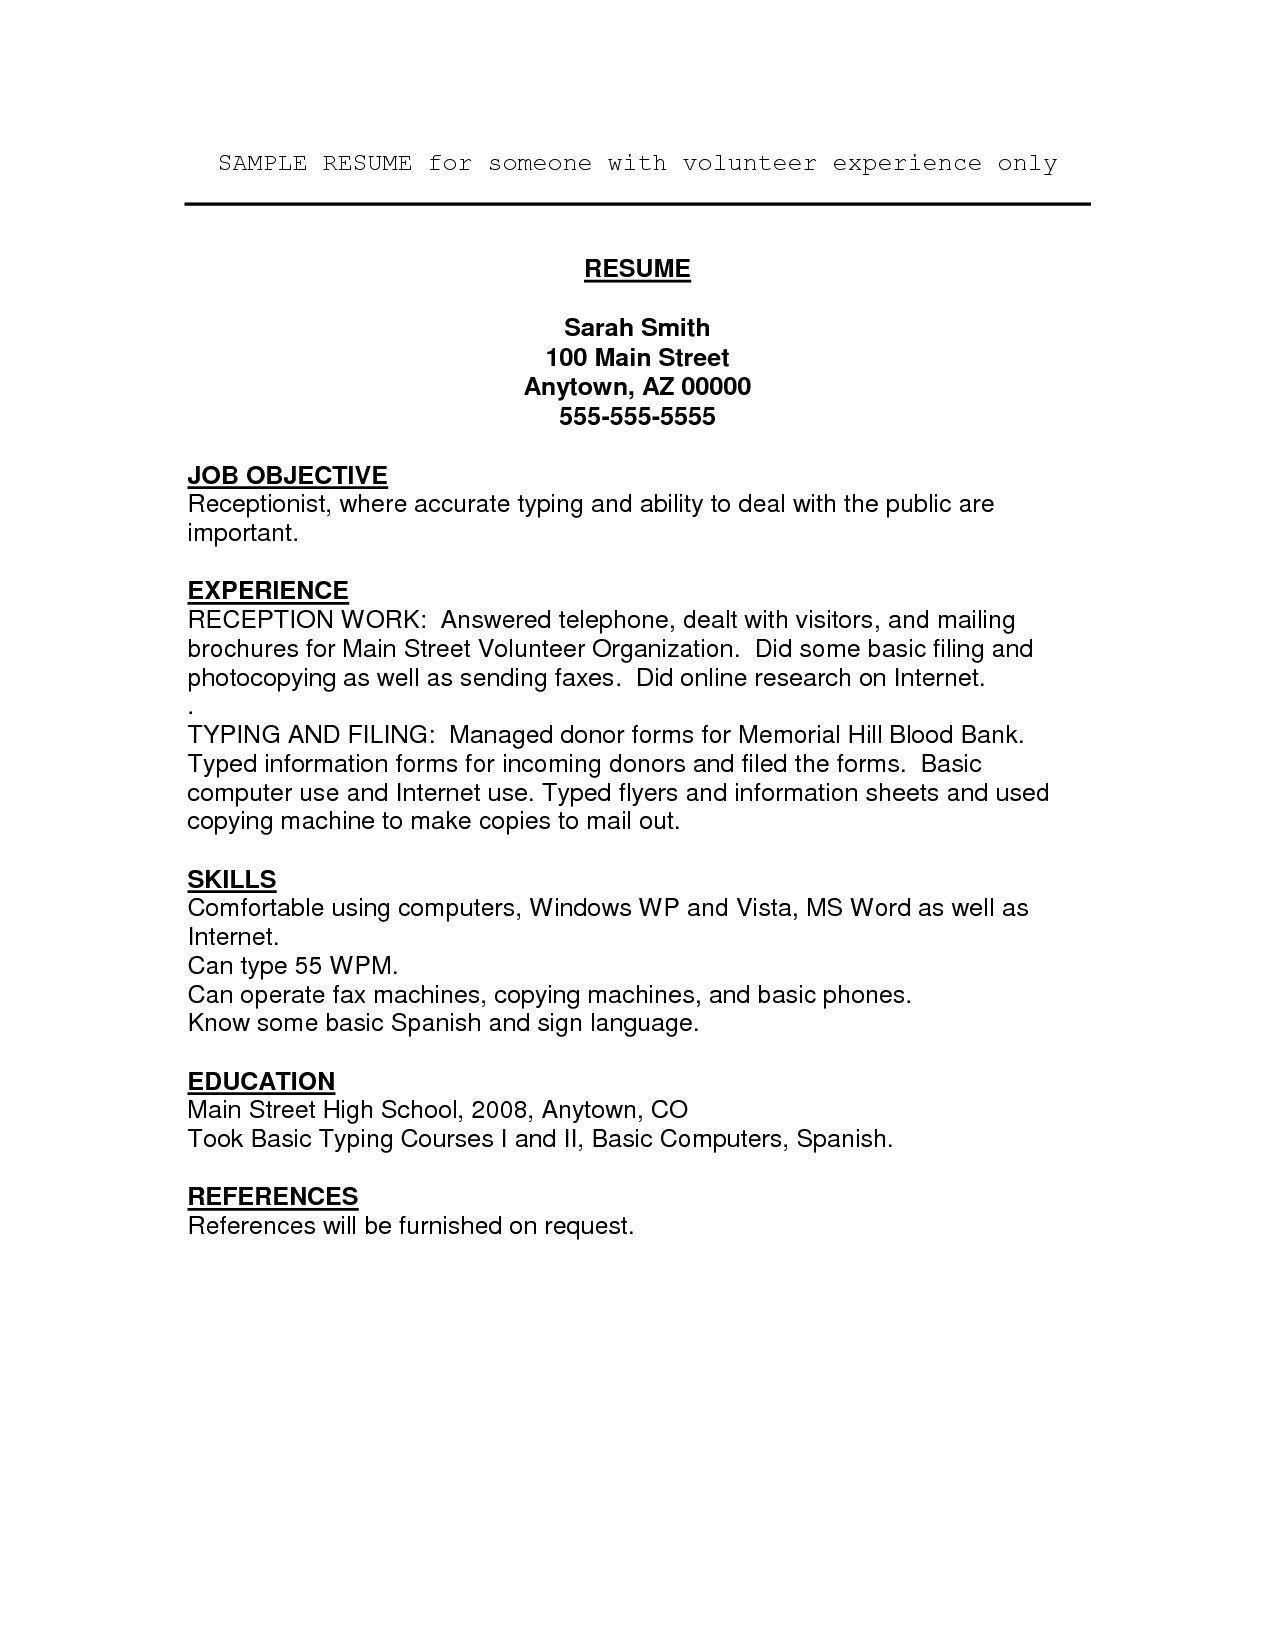 Sample Resume for Highschool Students with Volunteer Experience Free Volunteer Resume Templates - Resume Examples Basic Resume ...